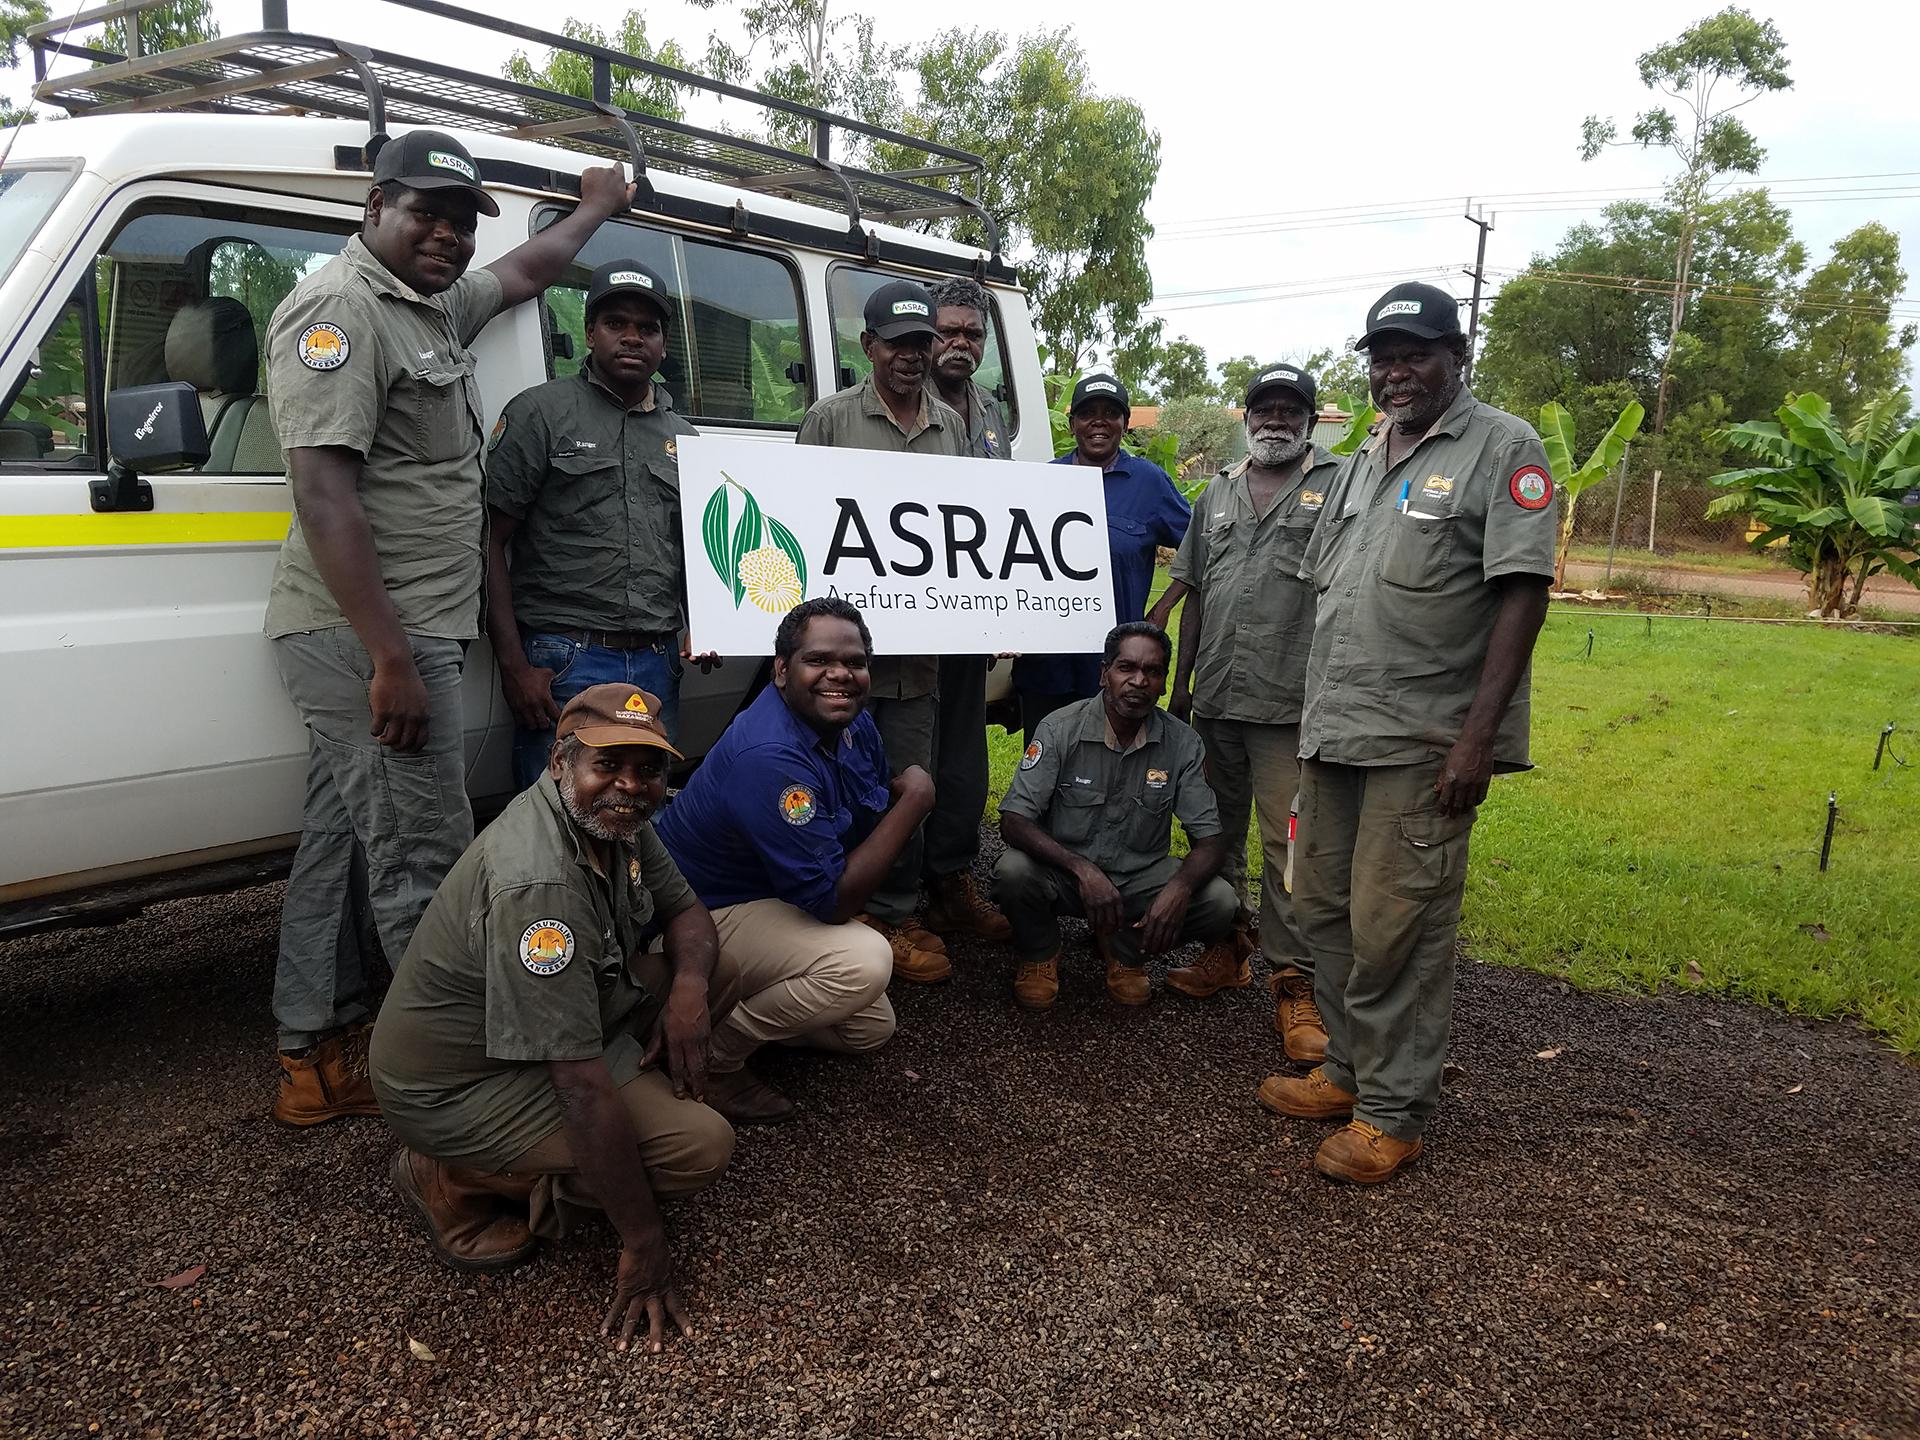 ASRAC wins contract